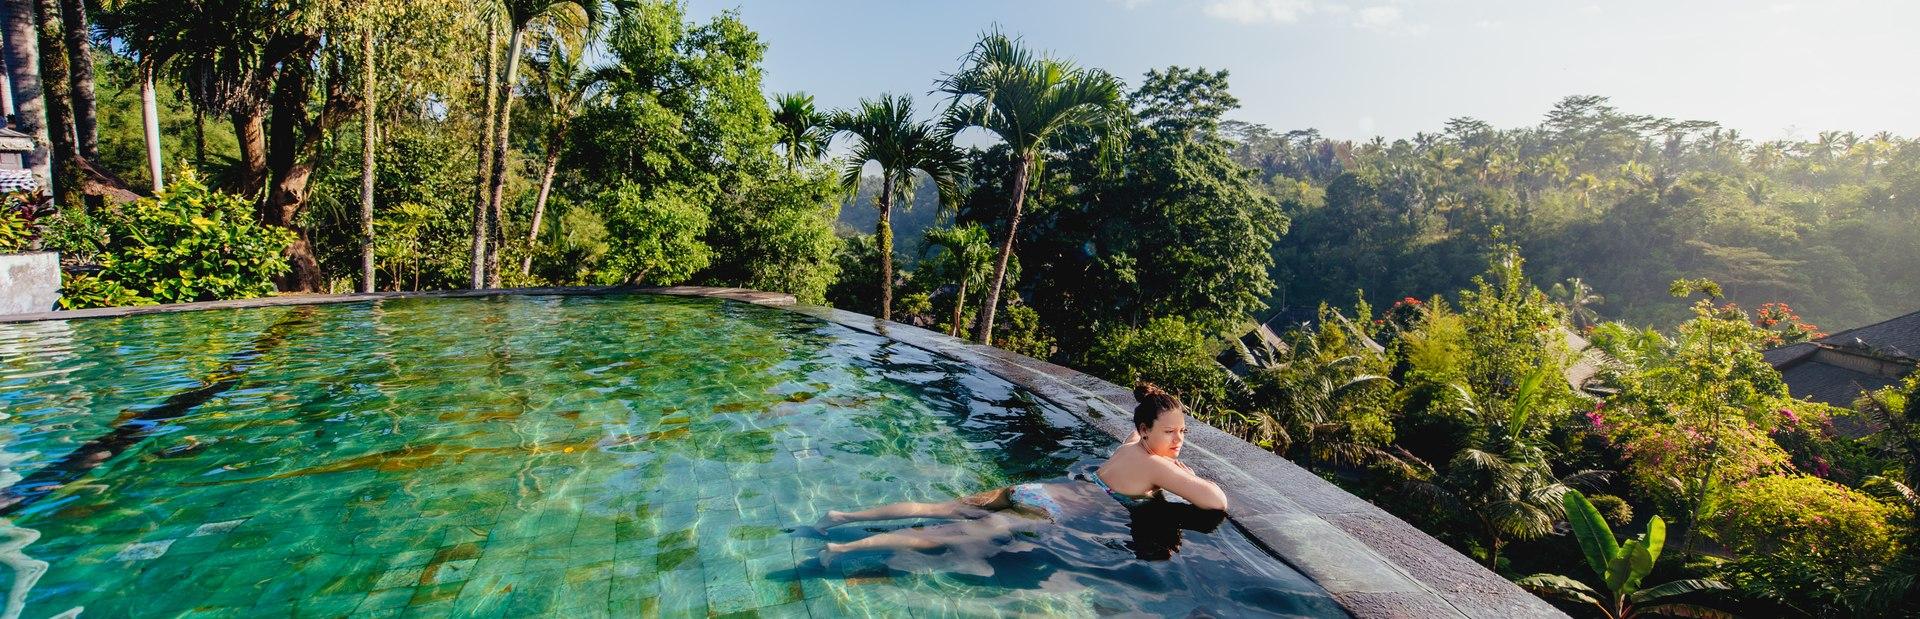 Meeru Island Resort and Spa Image 1